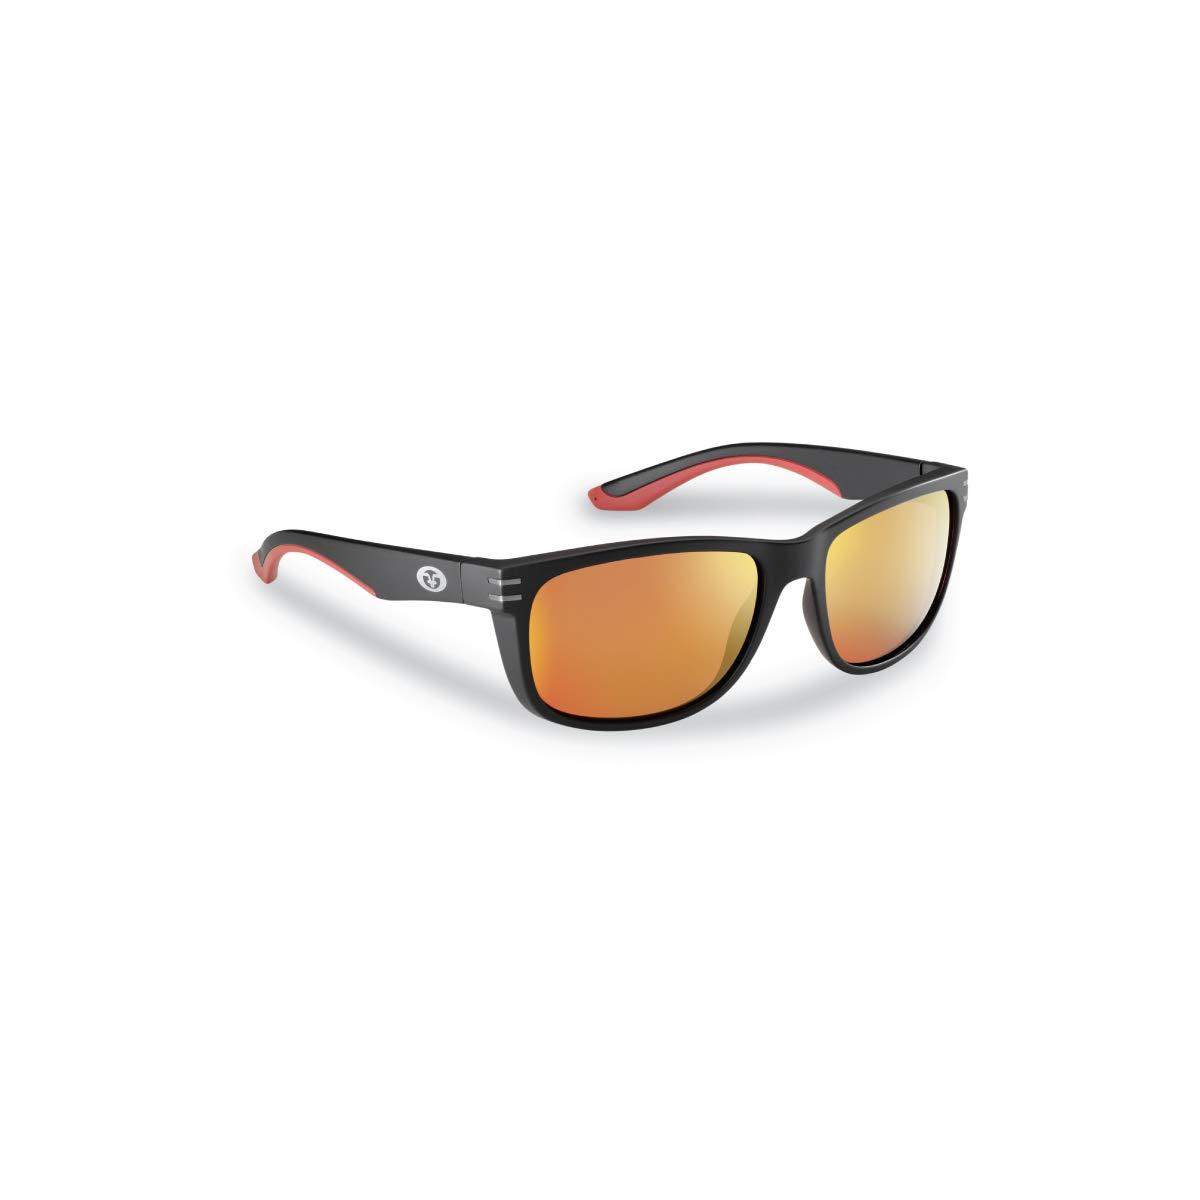 Flying Fisherman Polarized Sunglasses Amber Red